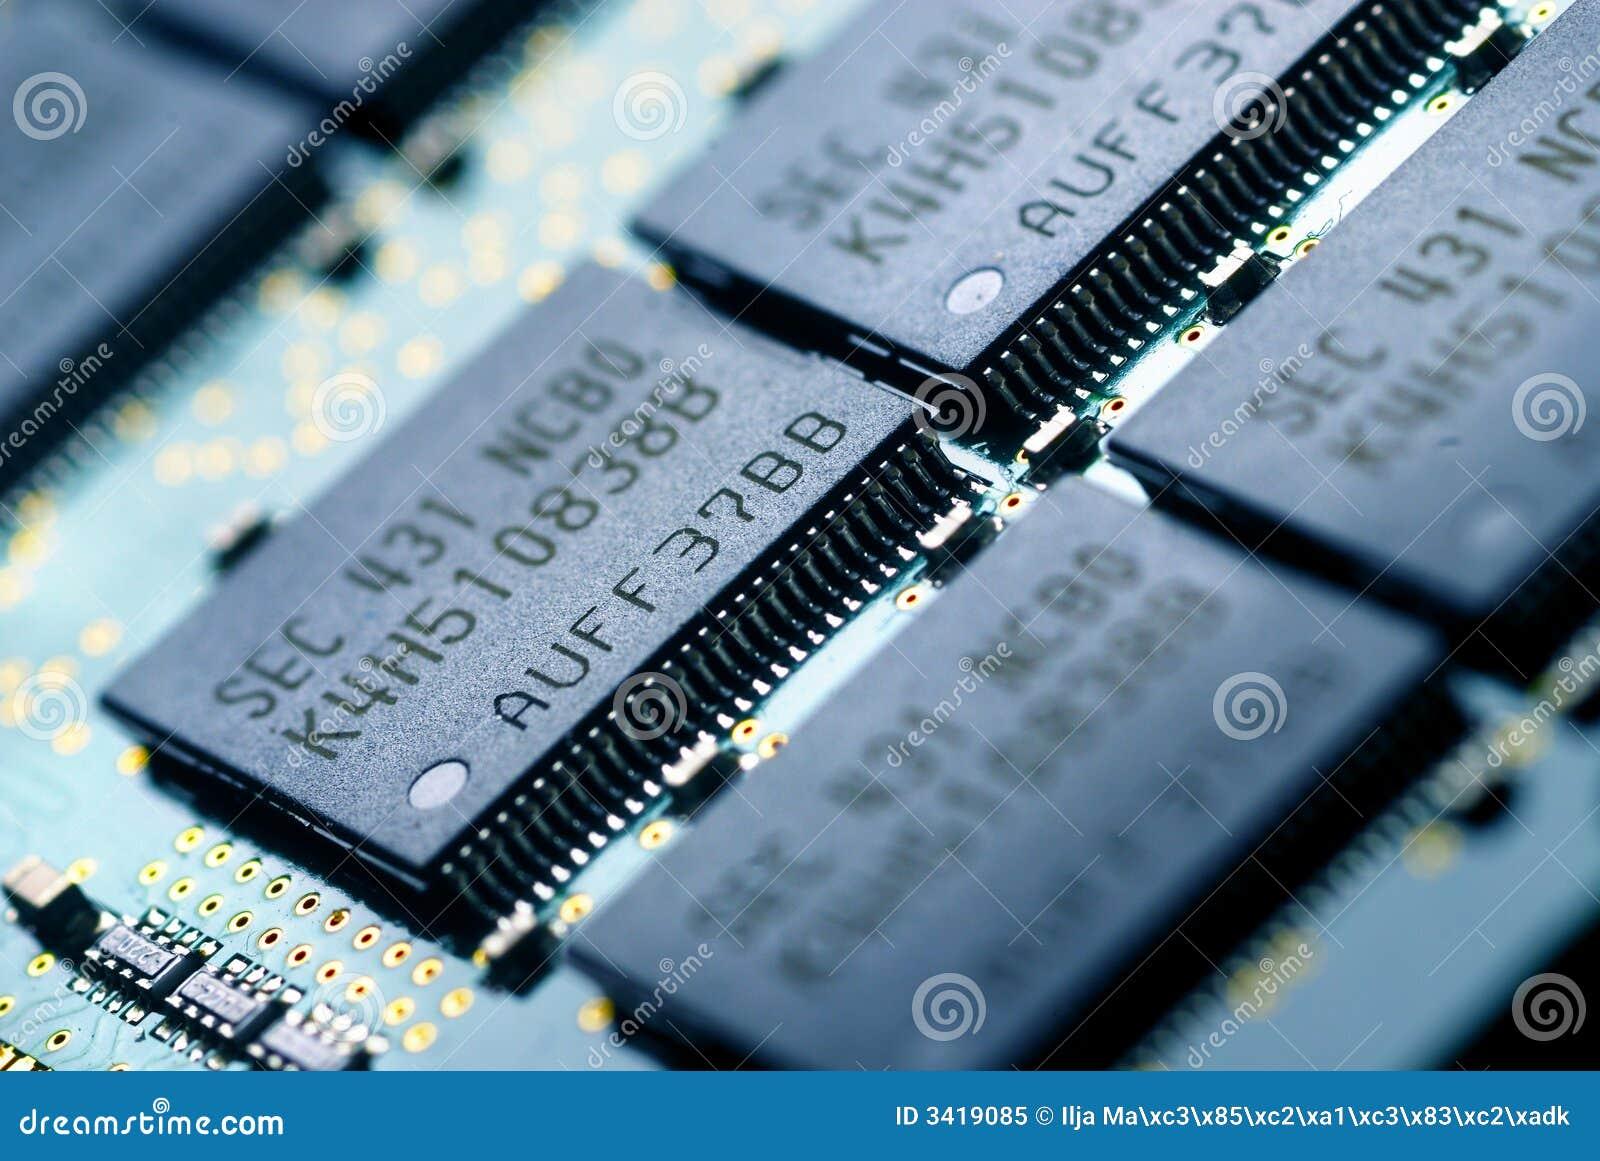 Elektronikteknologi